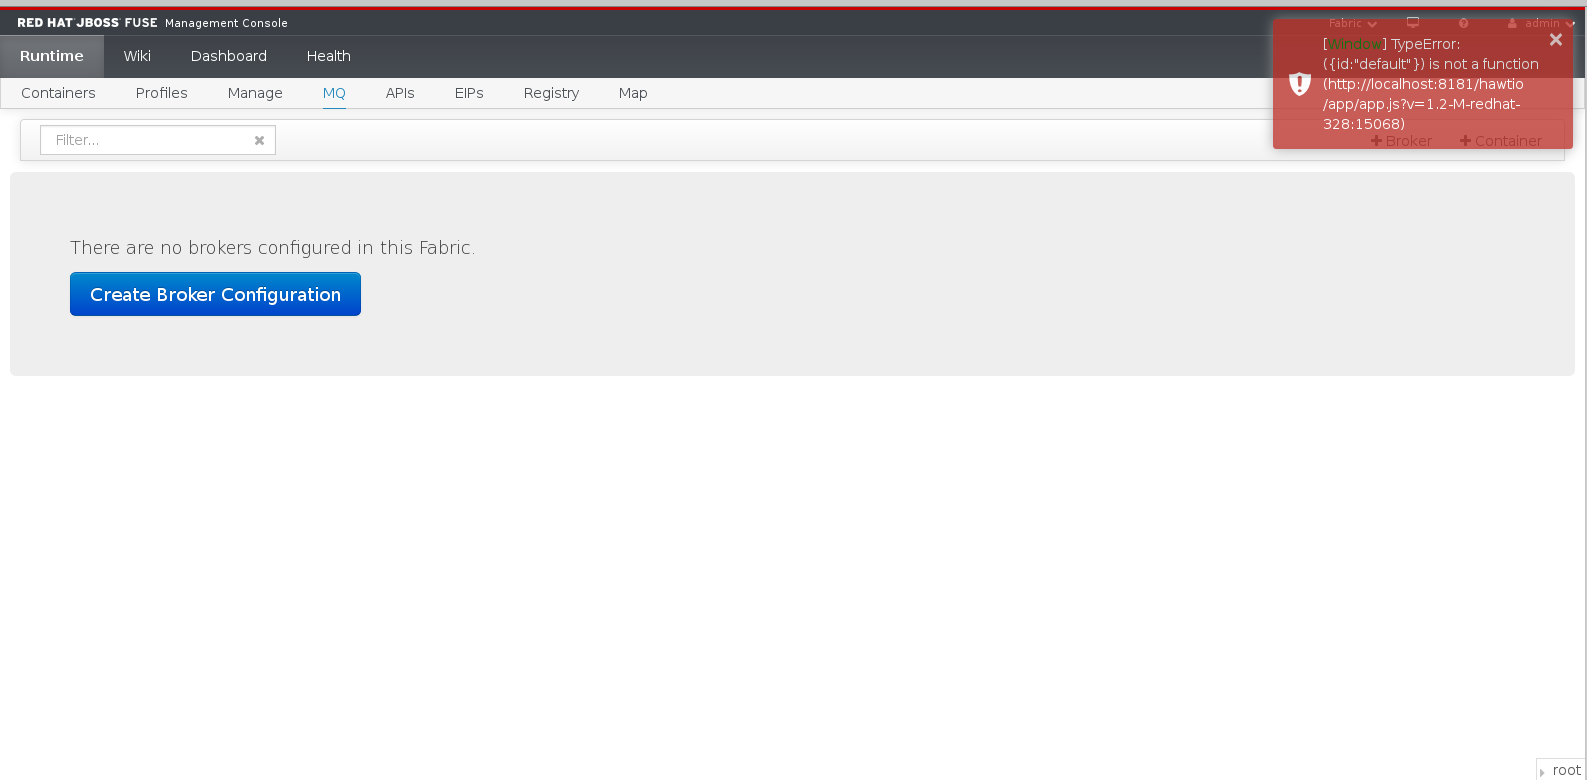 ENTESB-1176] Hawtio MQ tab doesn't show brokers in Firefox